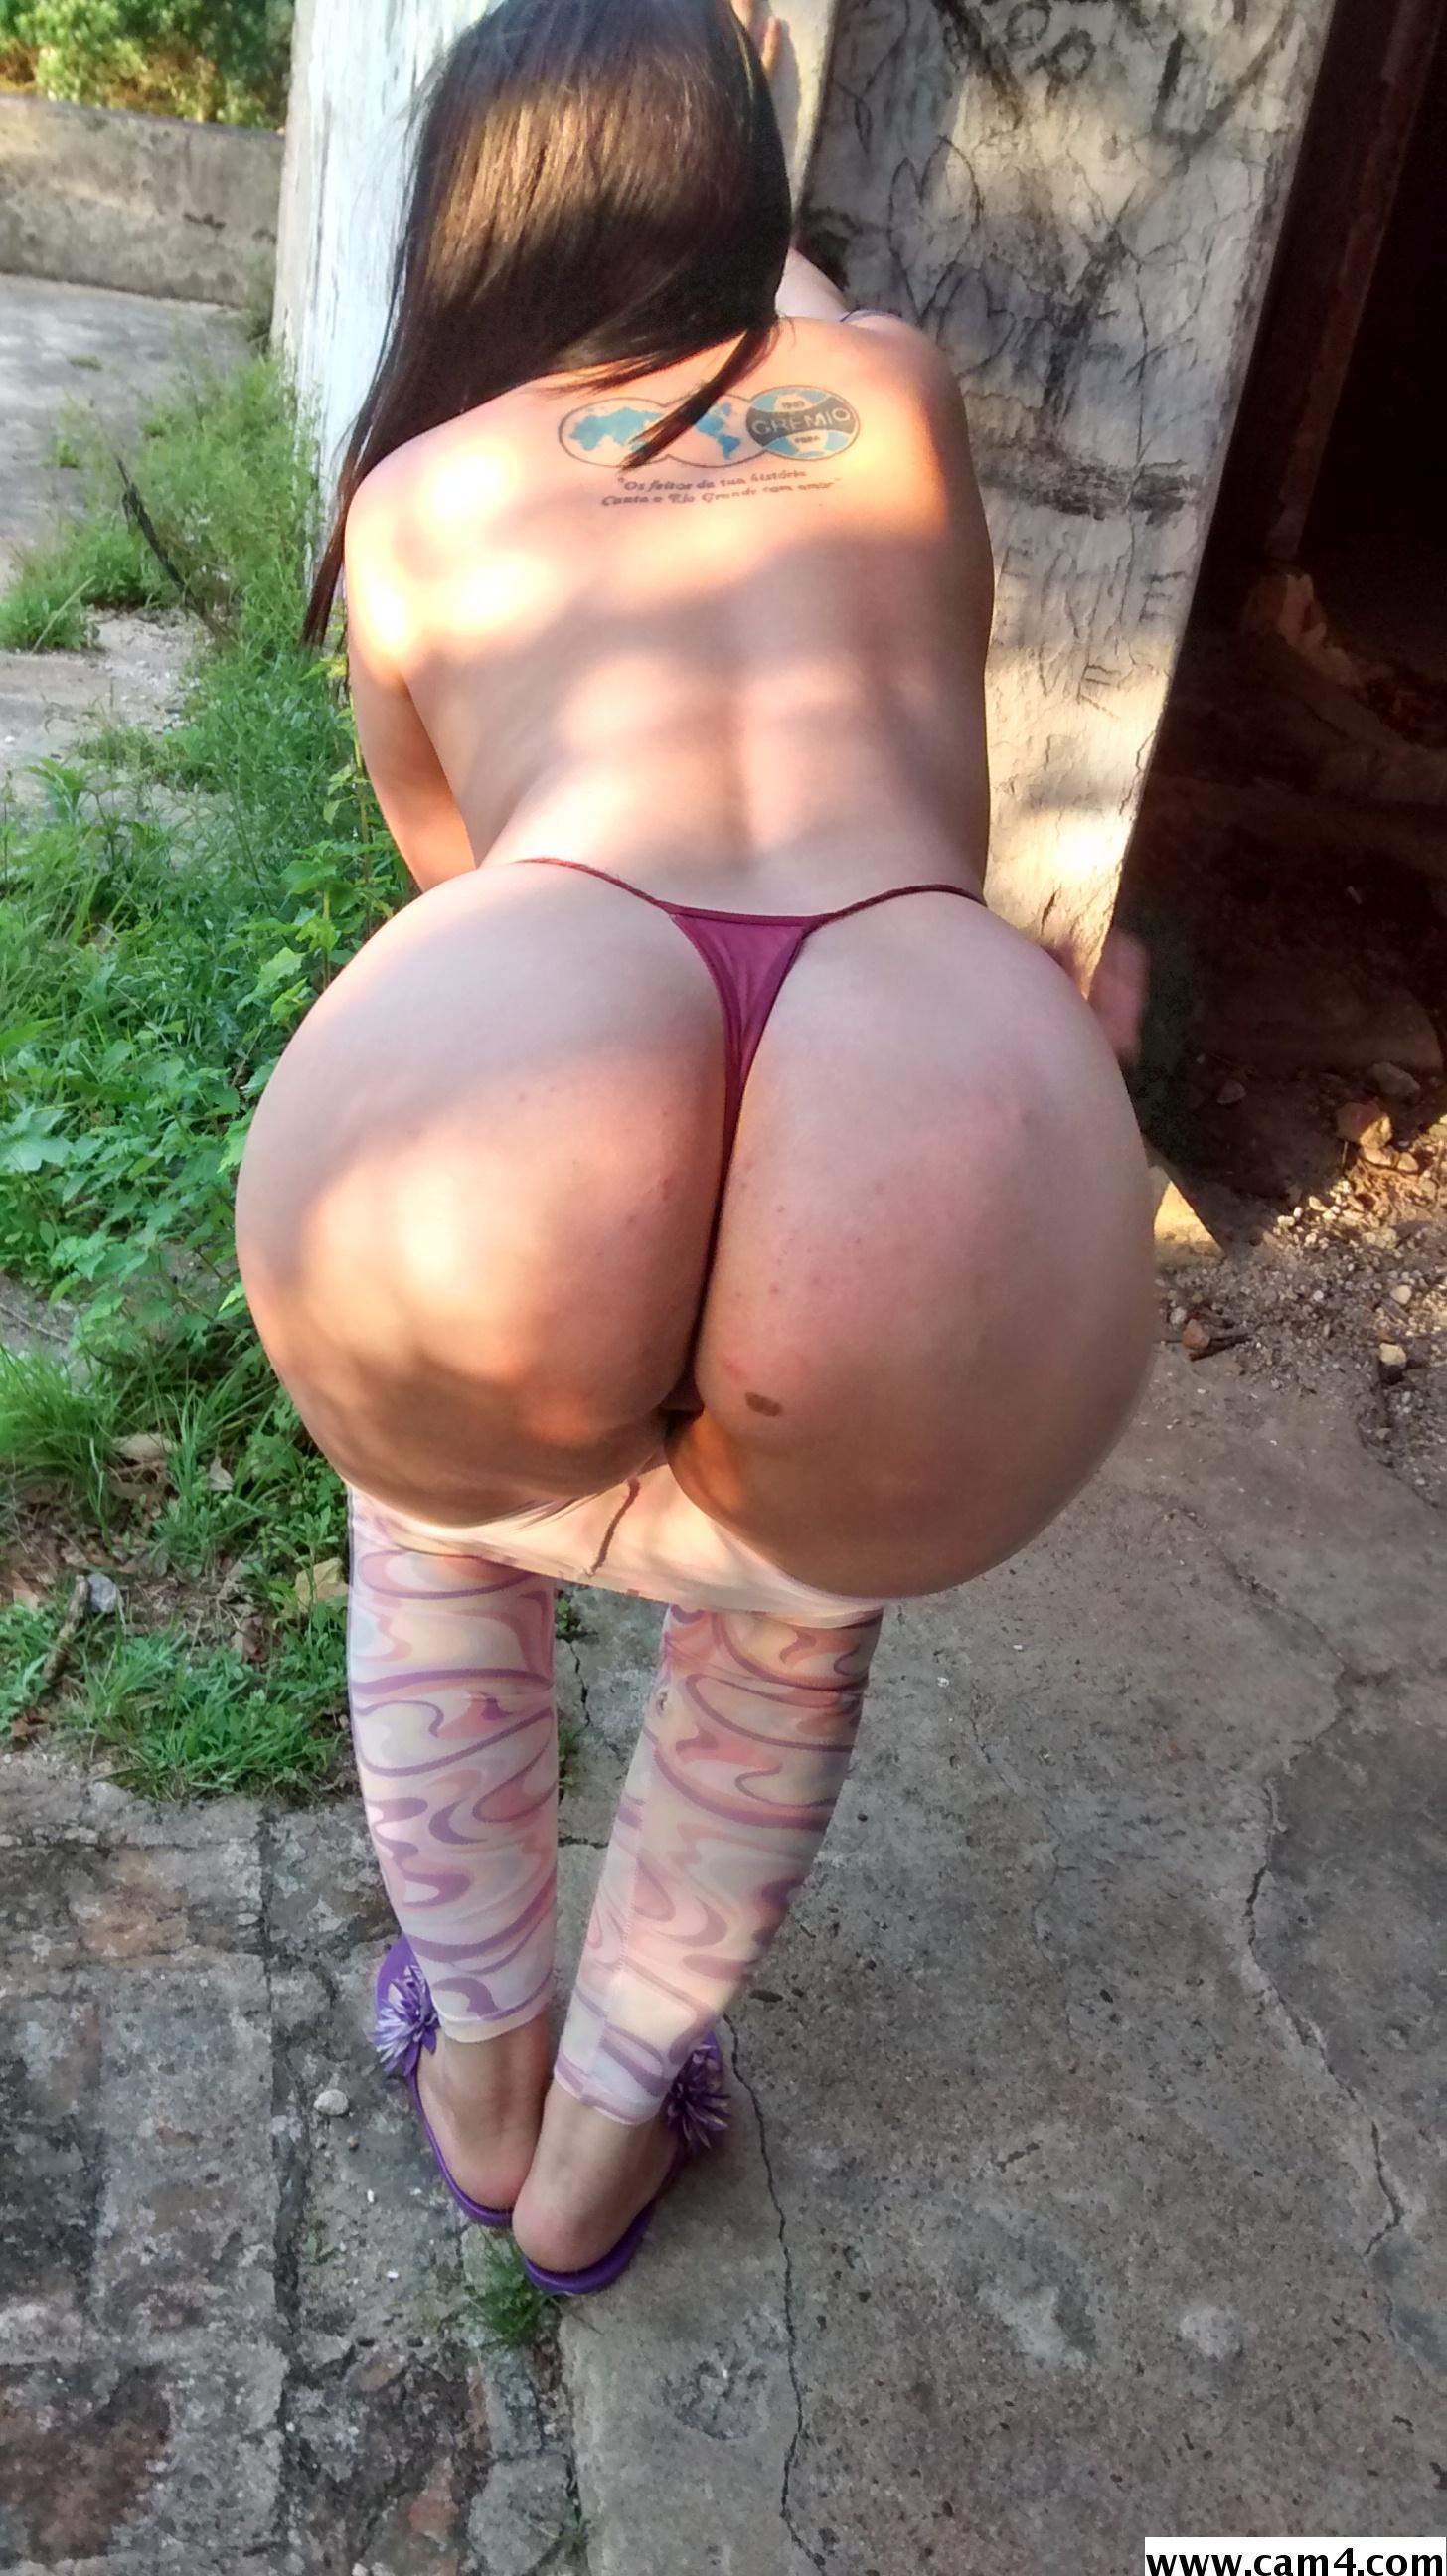 Sexygremista?s=pmi3cl8jmnrdsdoaeciewnsr2i9b078siuik5bcse+c=